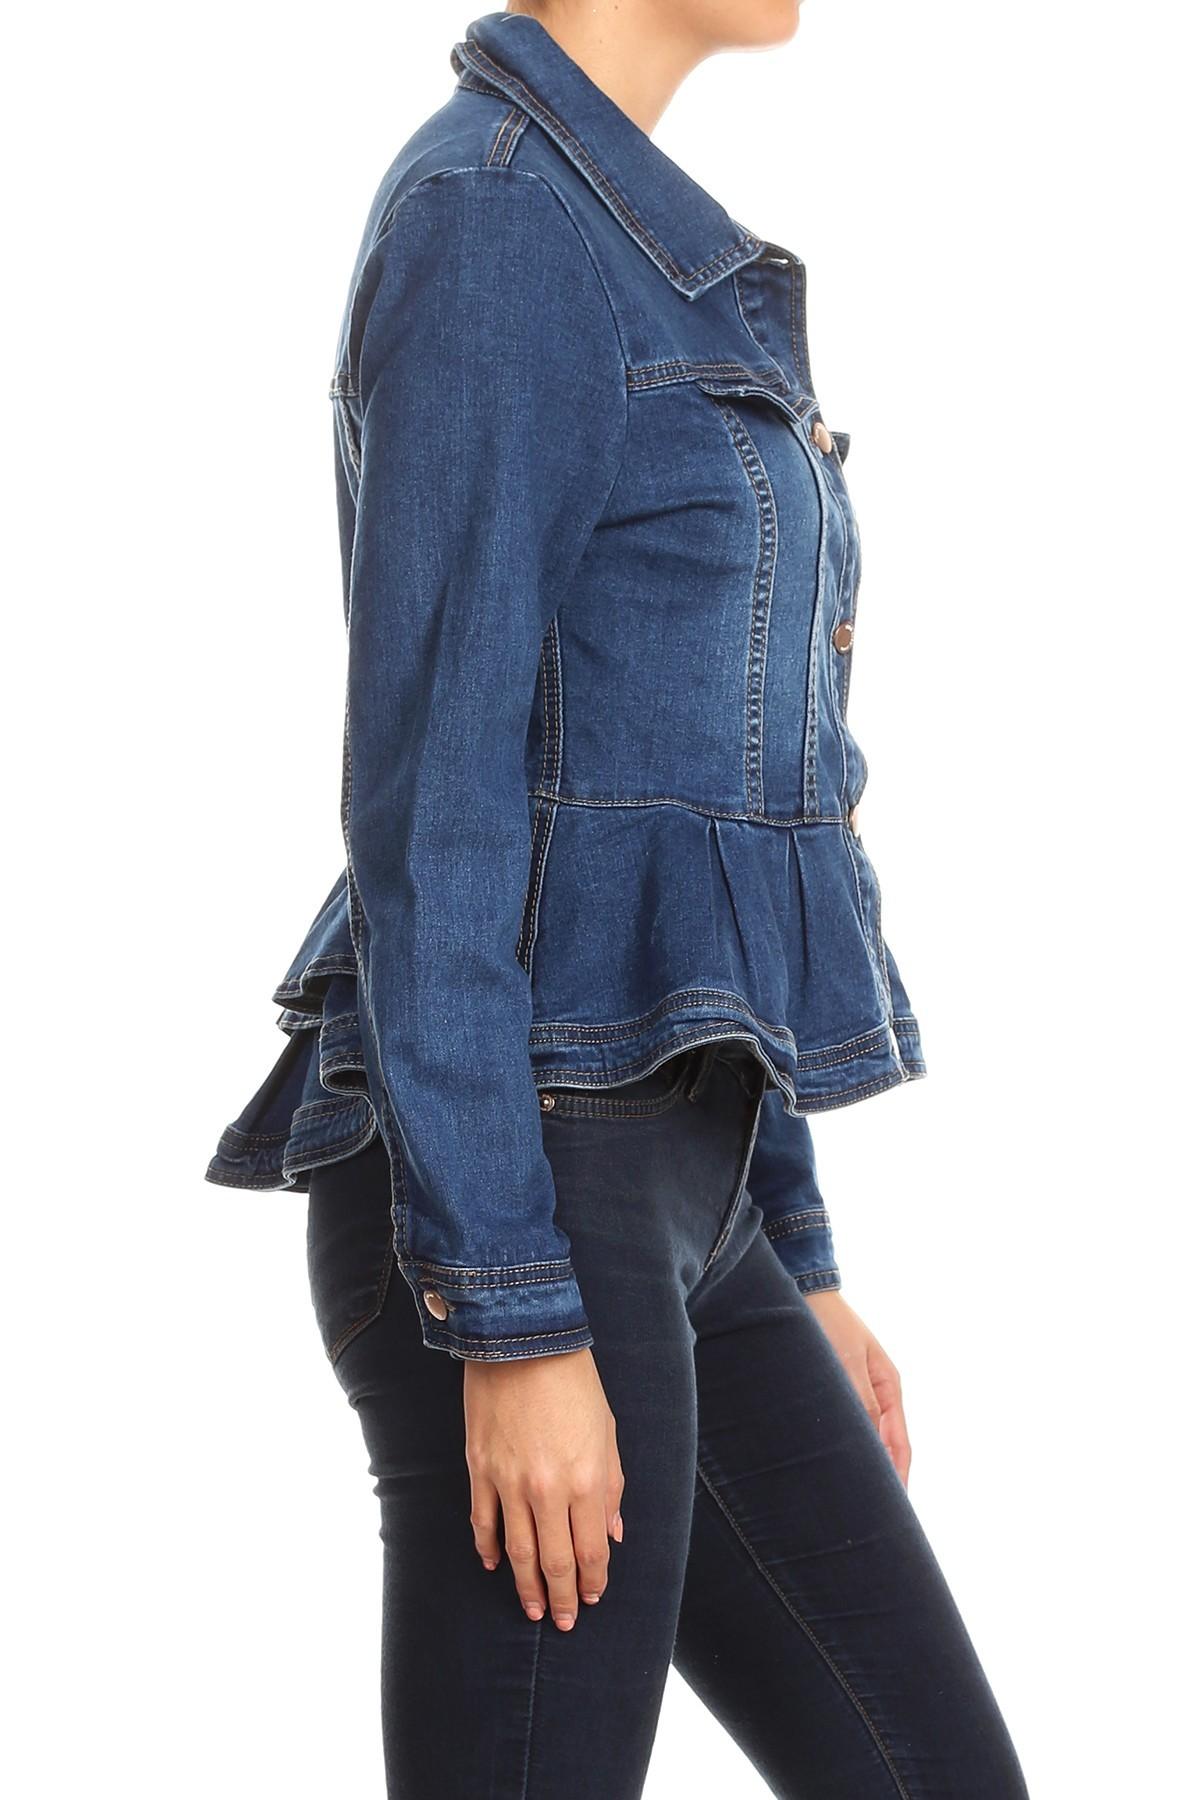 Women-039-s-Juniors-Premium-Denim-Peplum-Bodice-Long-Sleeve-Jacket thumbnail 9